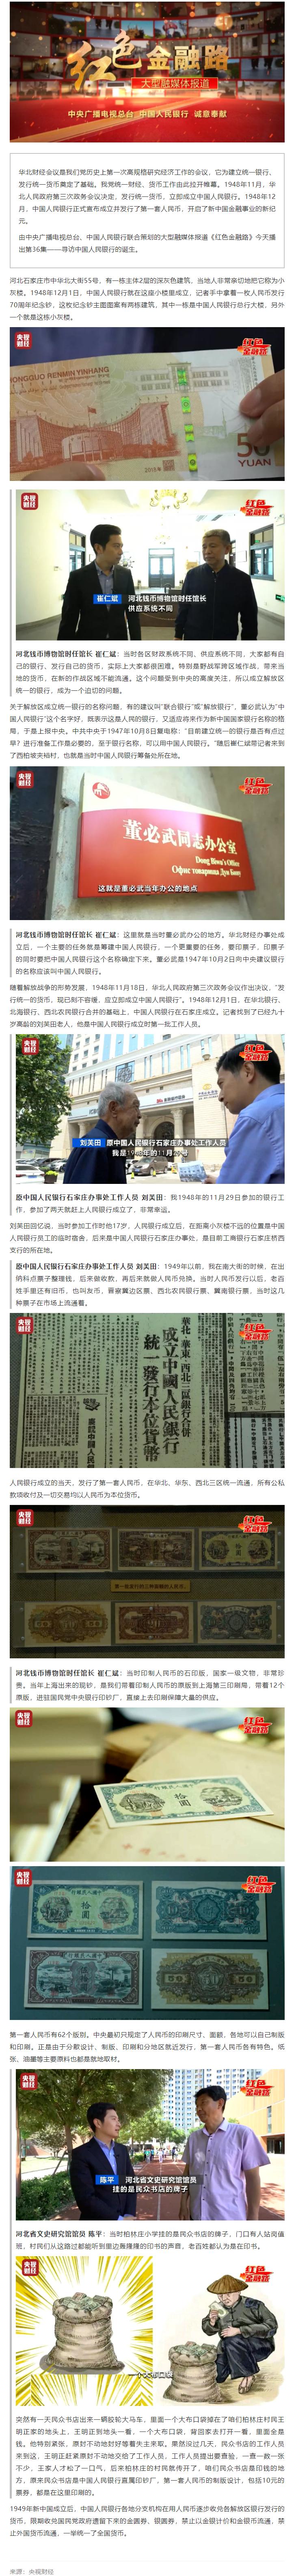 "FireShot Capture 213 - 【红色金融路】第36集:""印书地""实为""印钞地""!第一套人民币,这样诞生 - mp.weixin.qq.com.png"